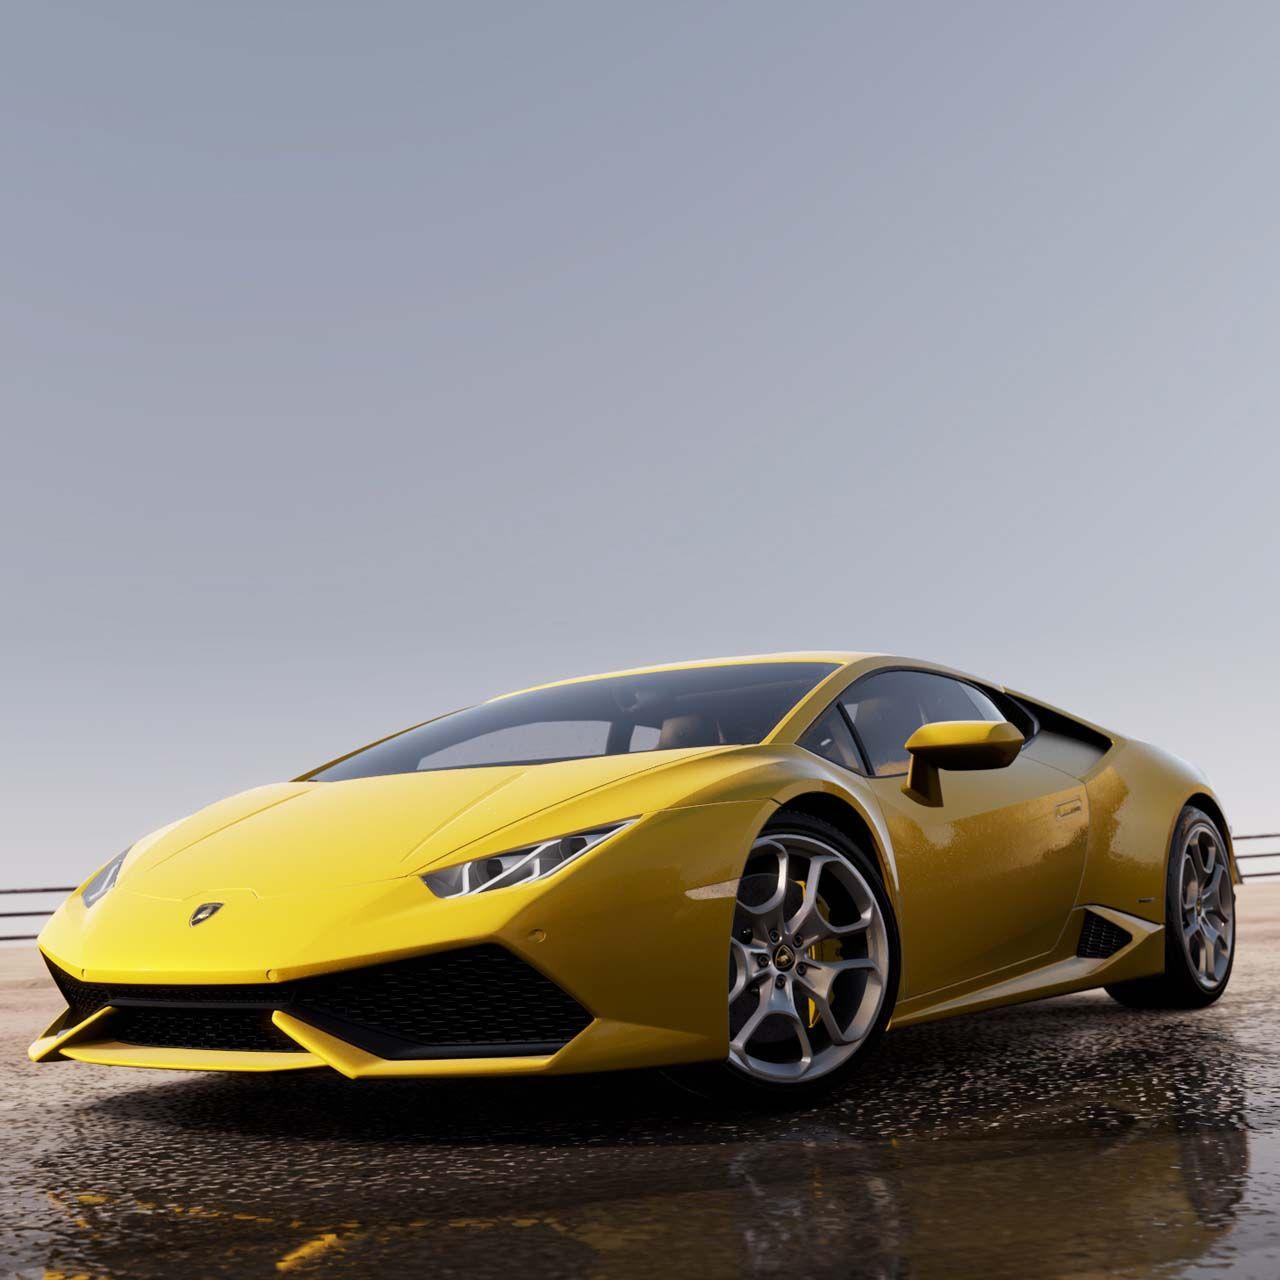 The New Lamborghini Huracán LP 610-4 Is The Hero Of Forza